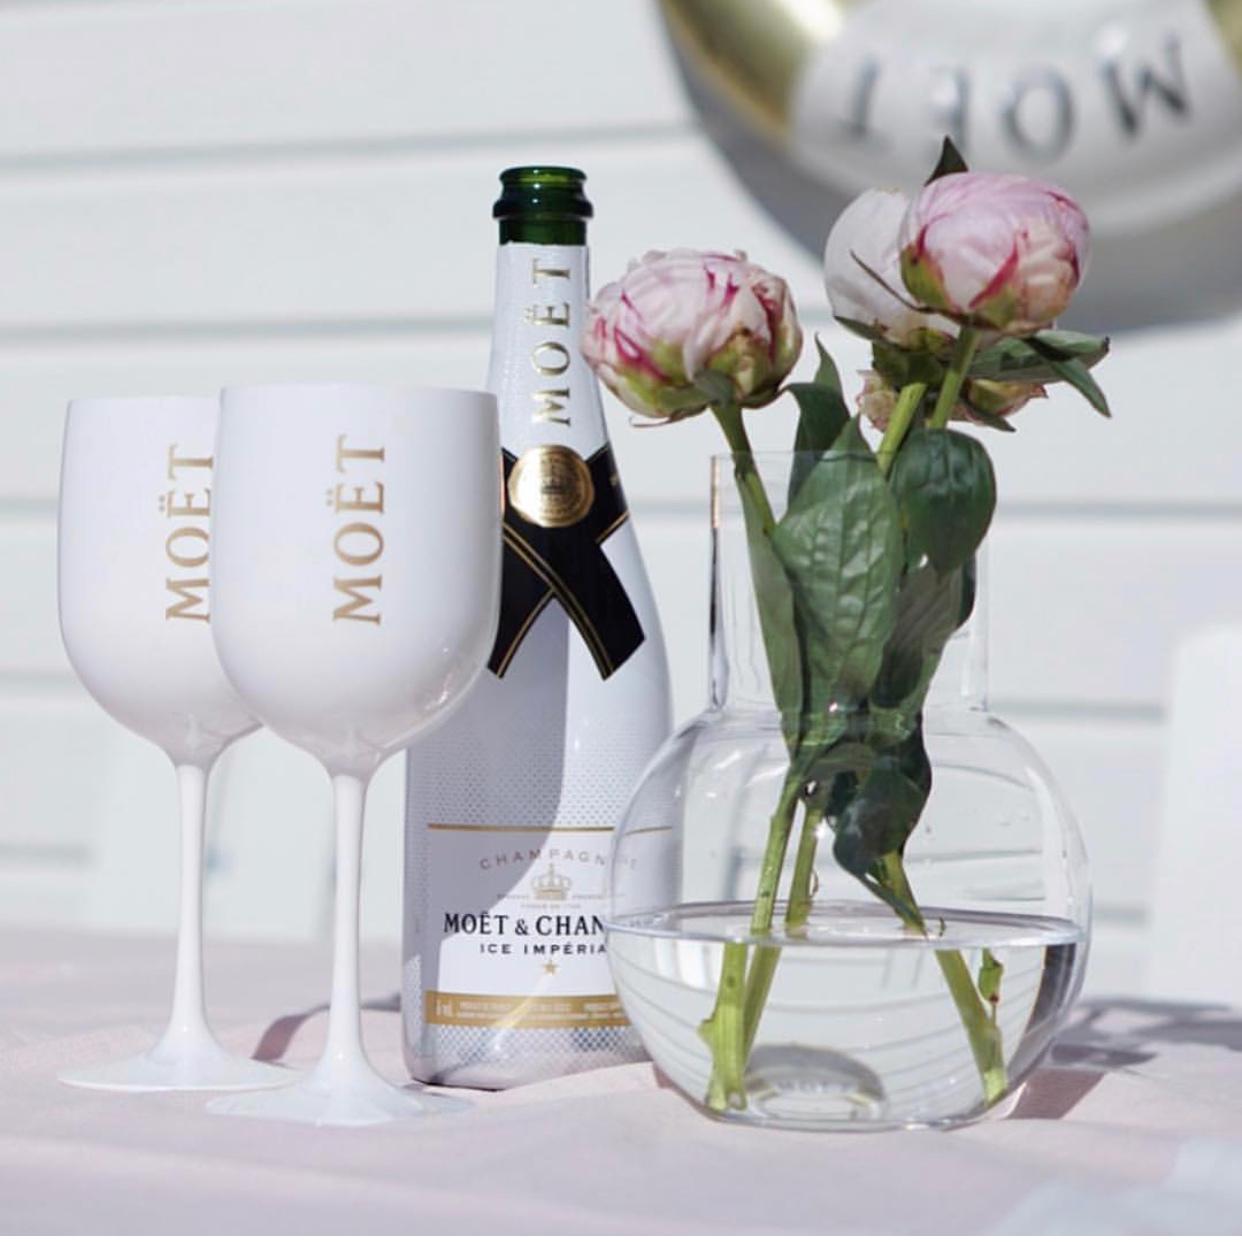 Moët & Chandon - White Glas (4 st)